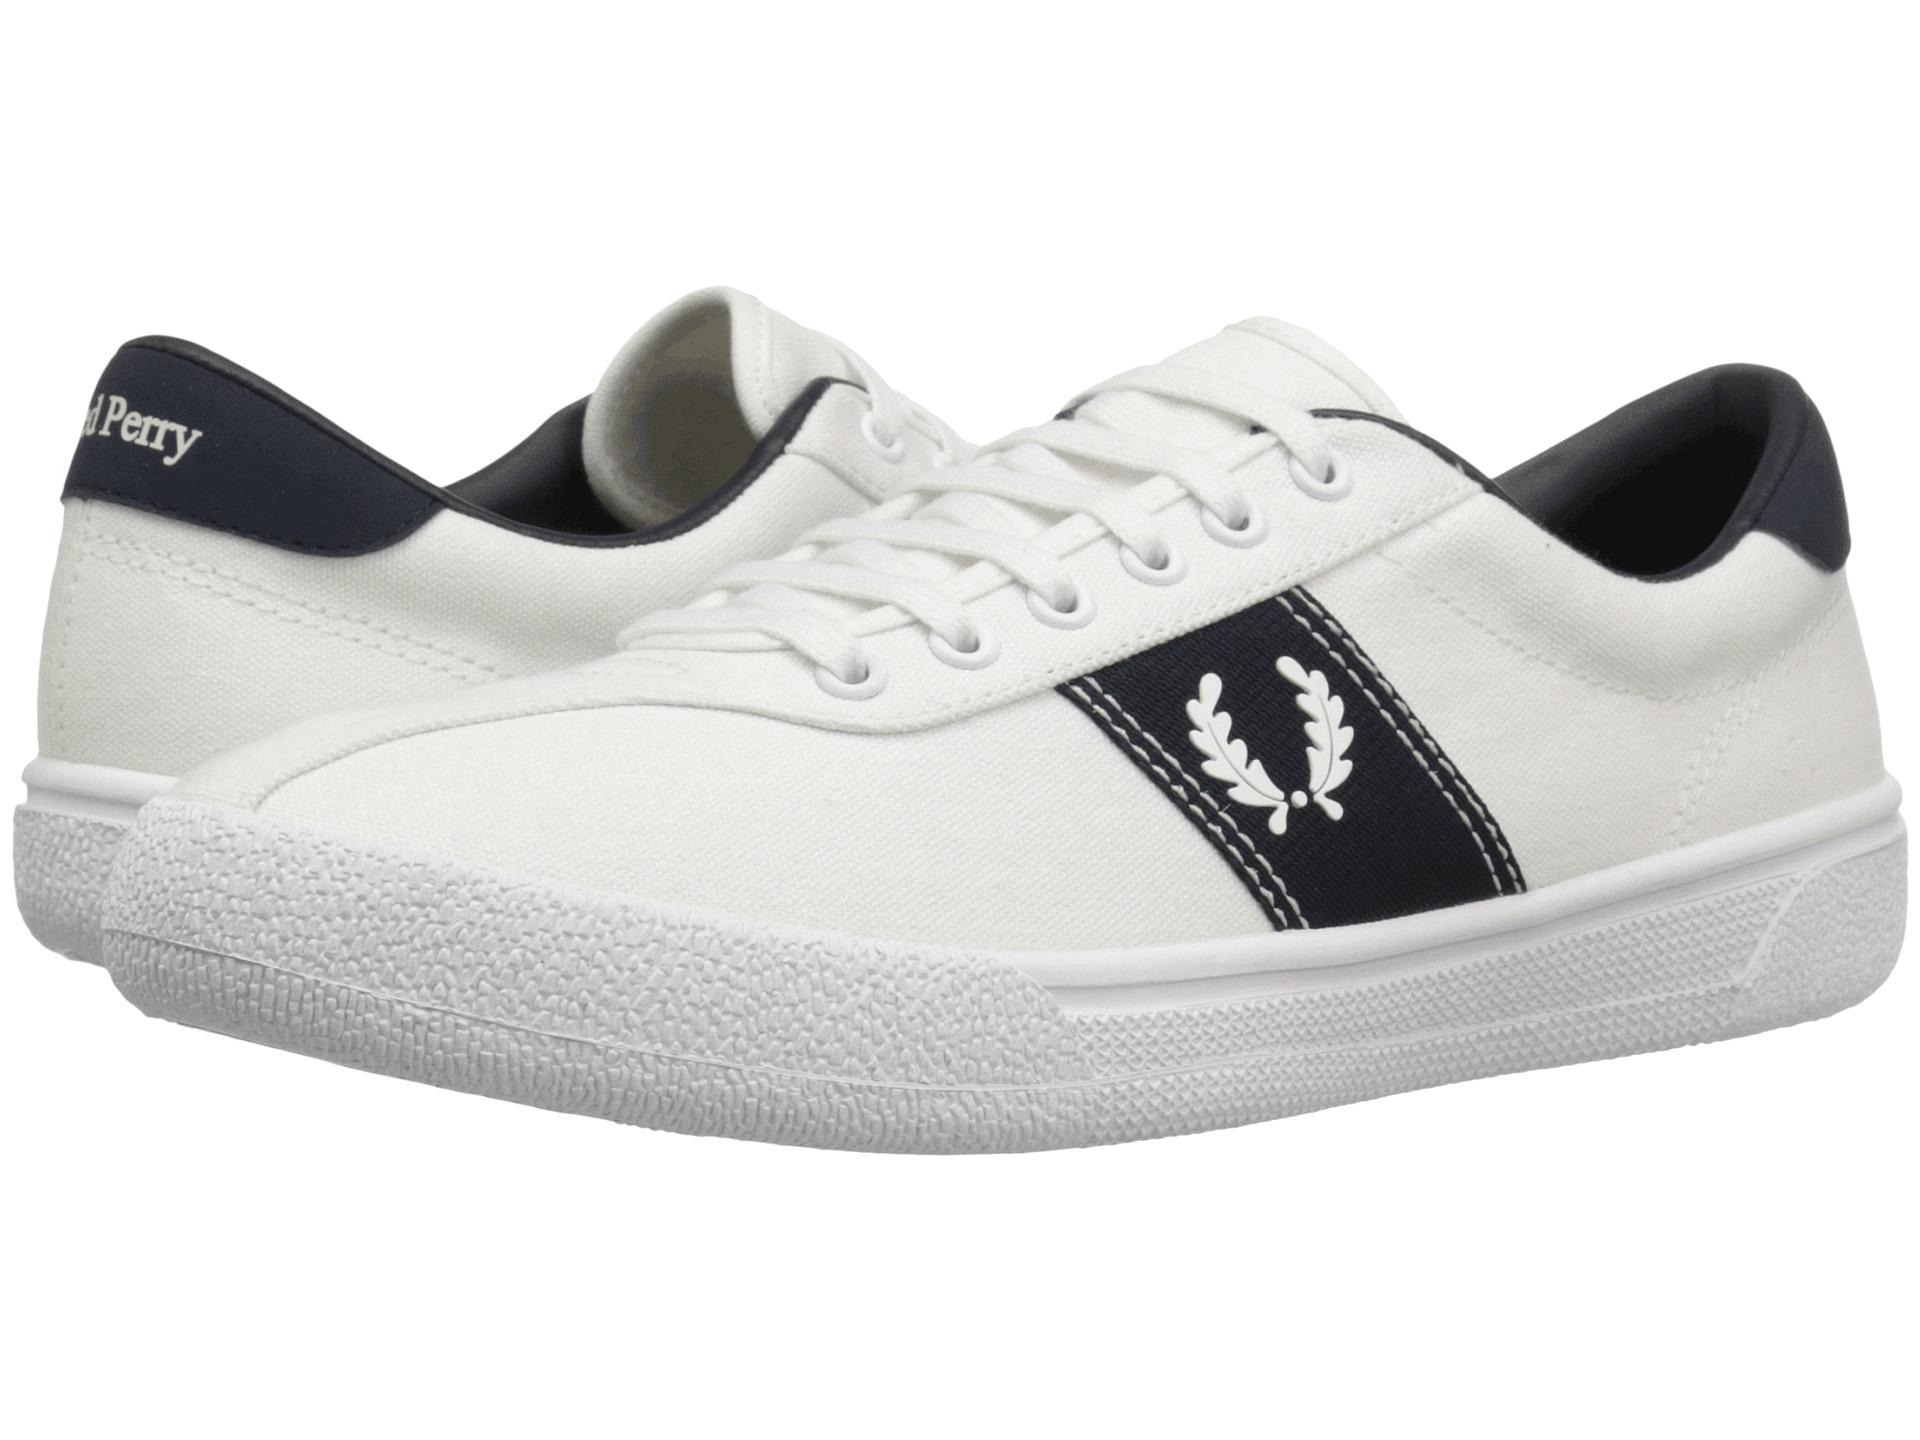 fred perry tennis shoe 1 canvas snow white snow white navy